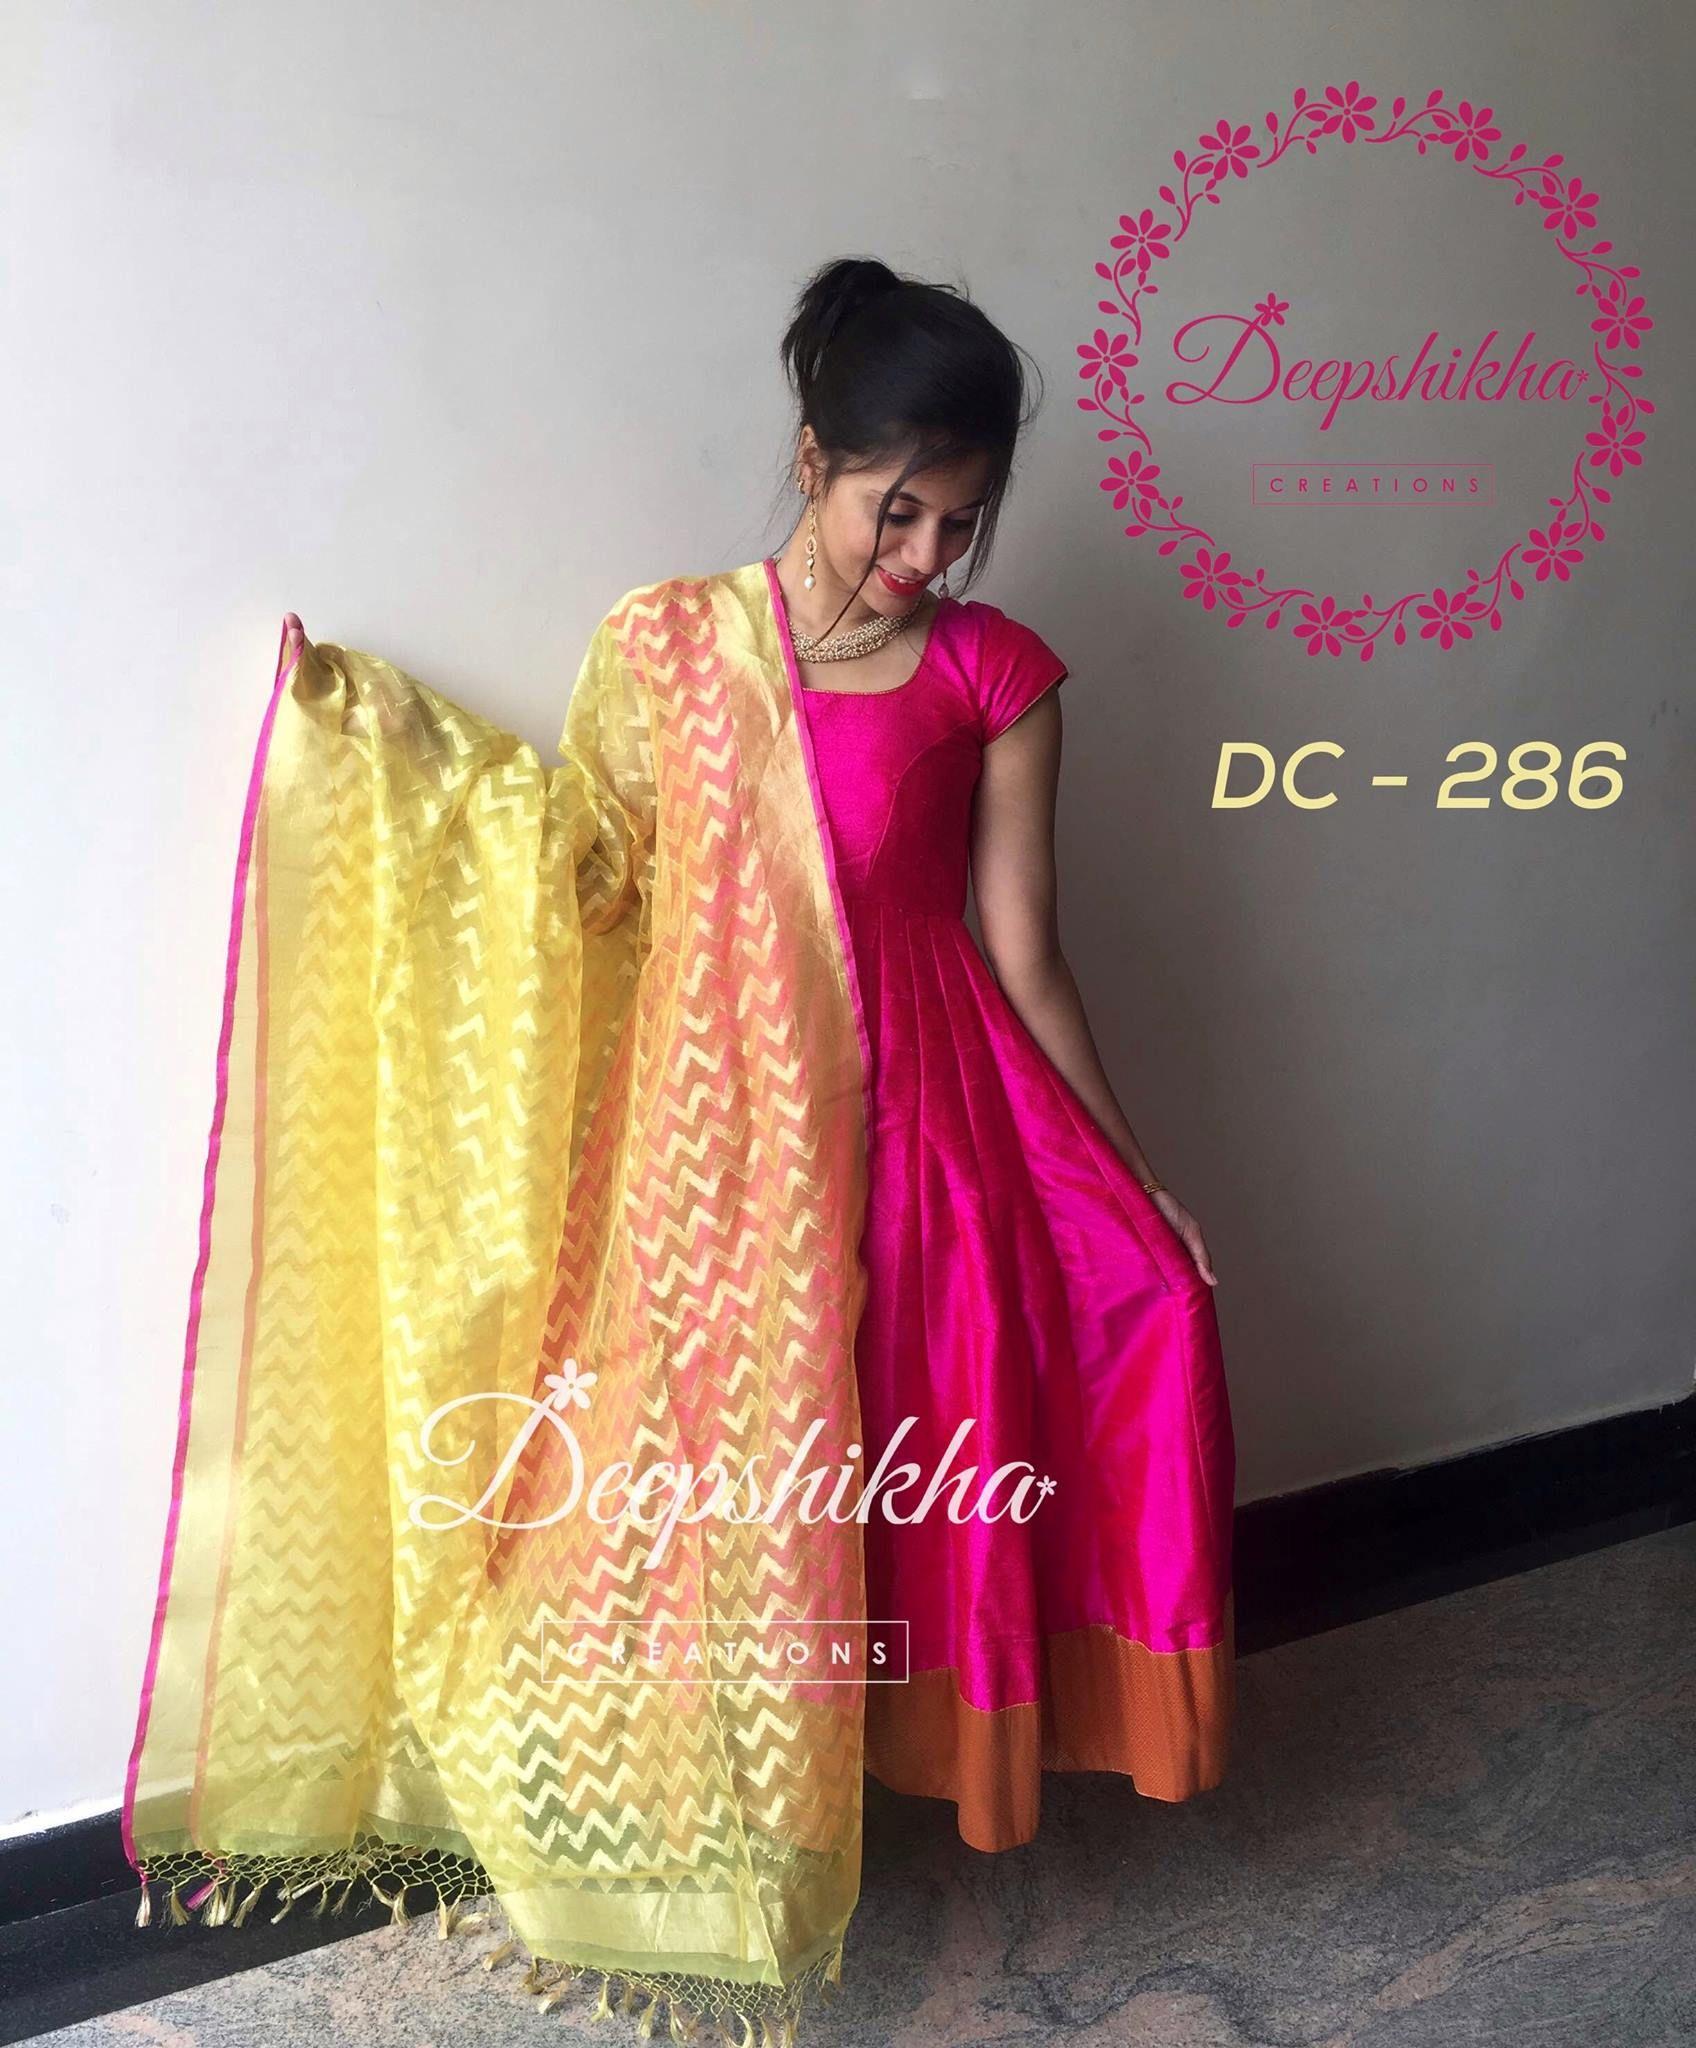 f1ed82383fd76 Deepshikha Creations. https   www.facebook.com DeepshikhaCreations .